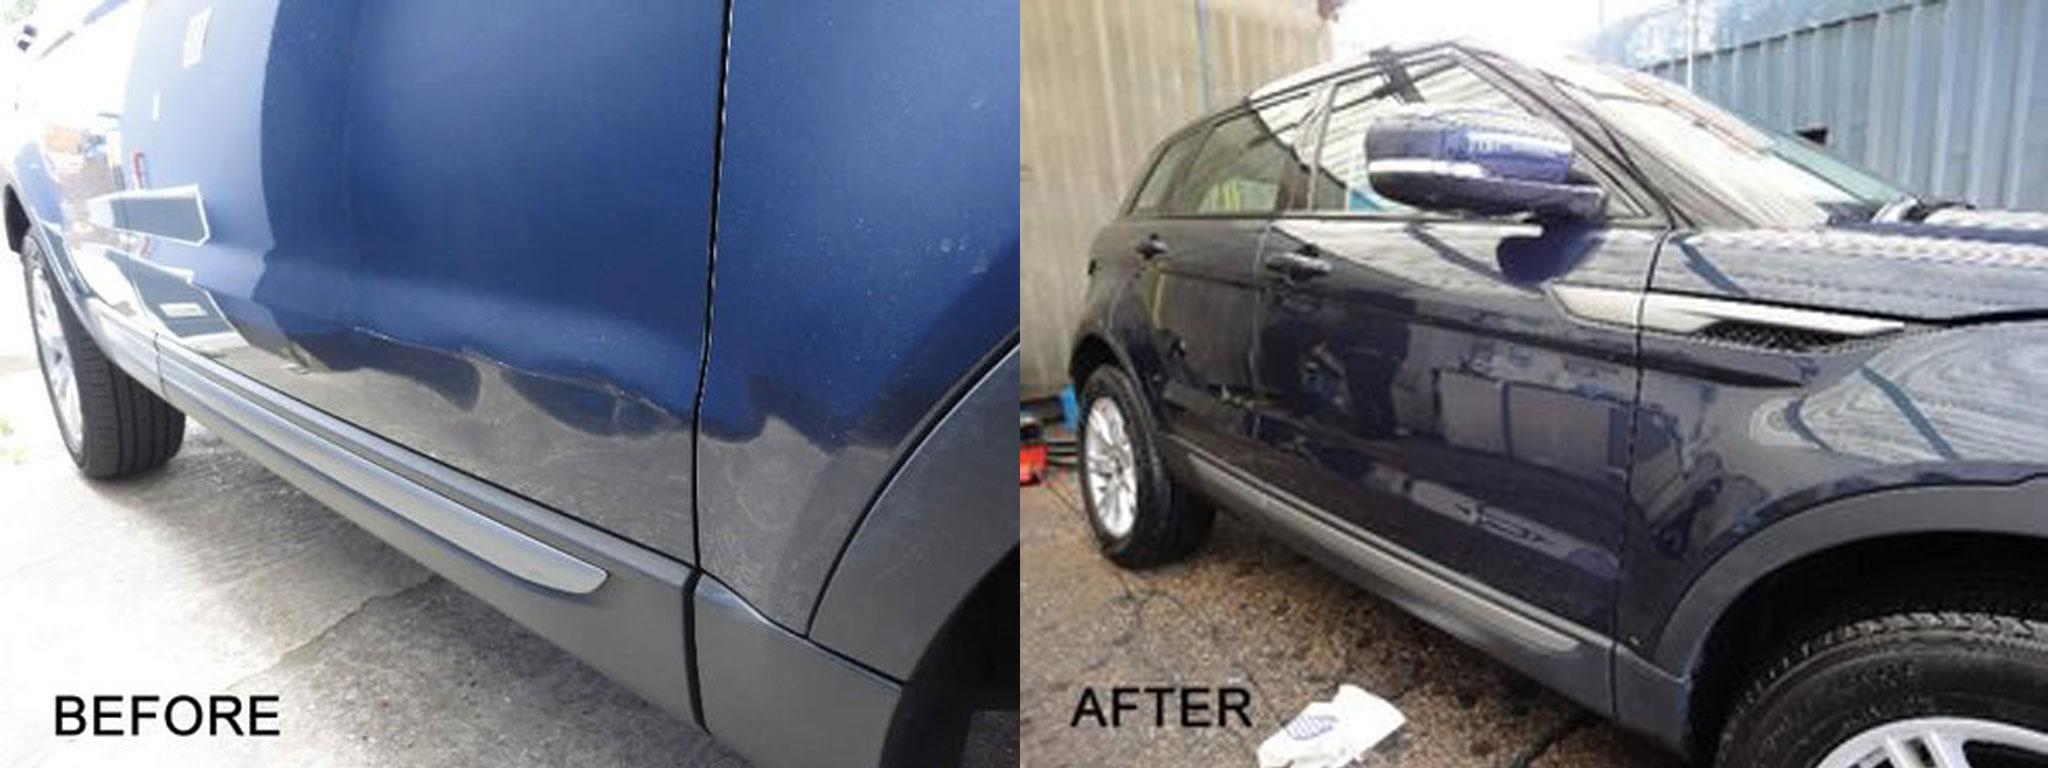 Range Rover scratch repair